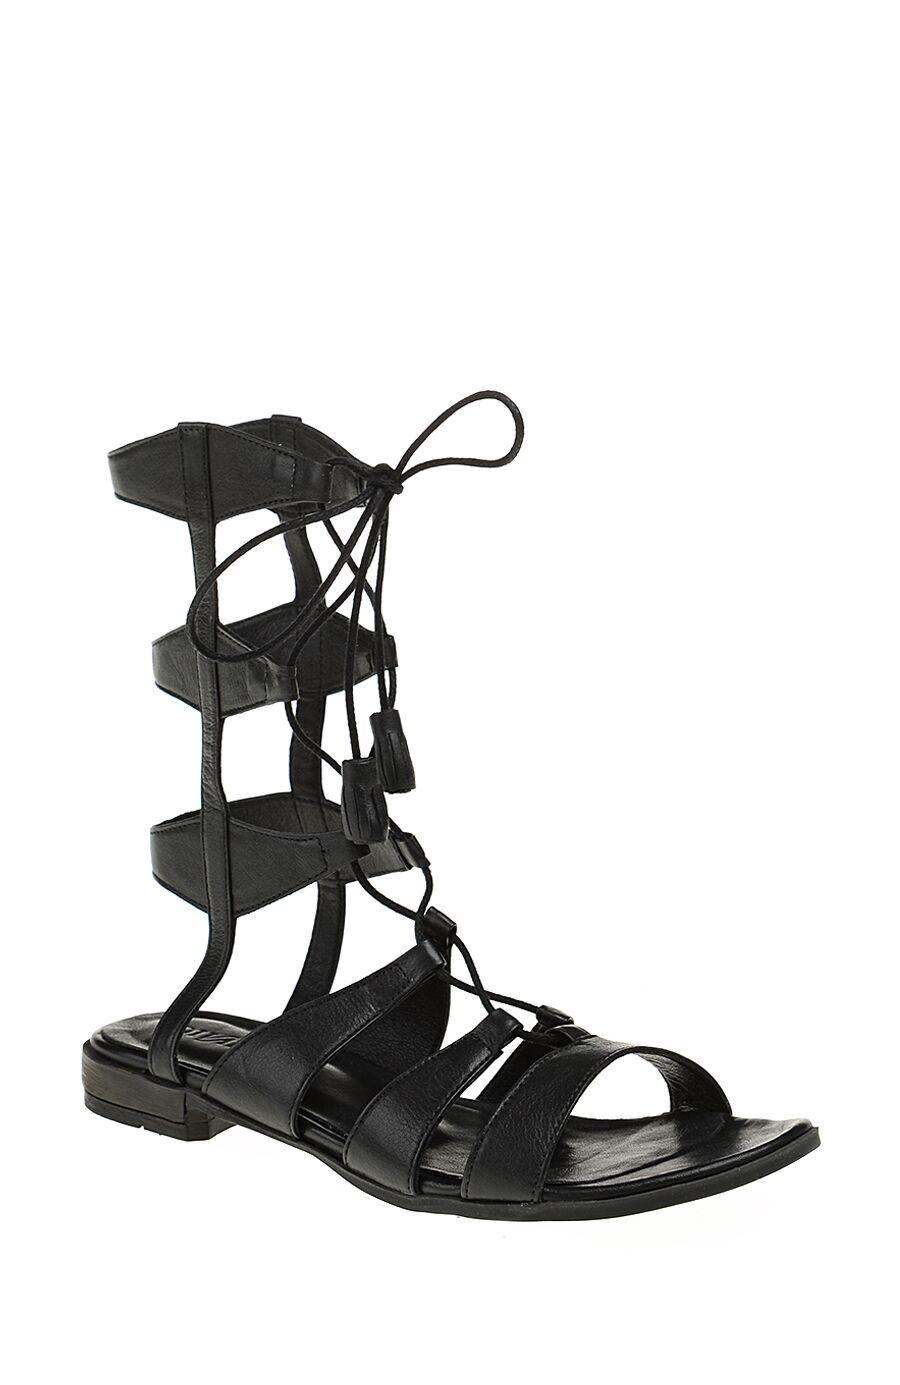 Dıvarese Siyah Deri Sandalet – 189.0 TL